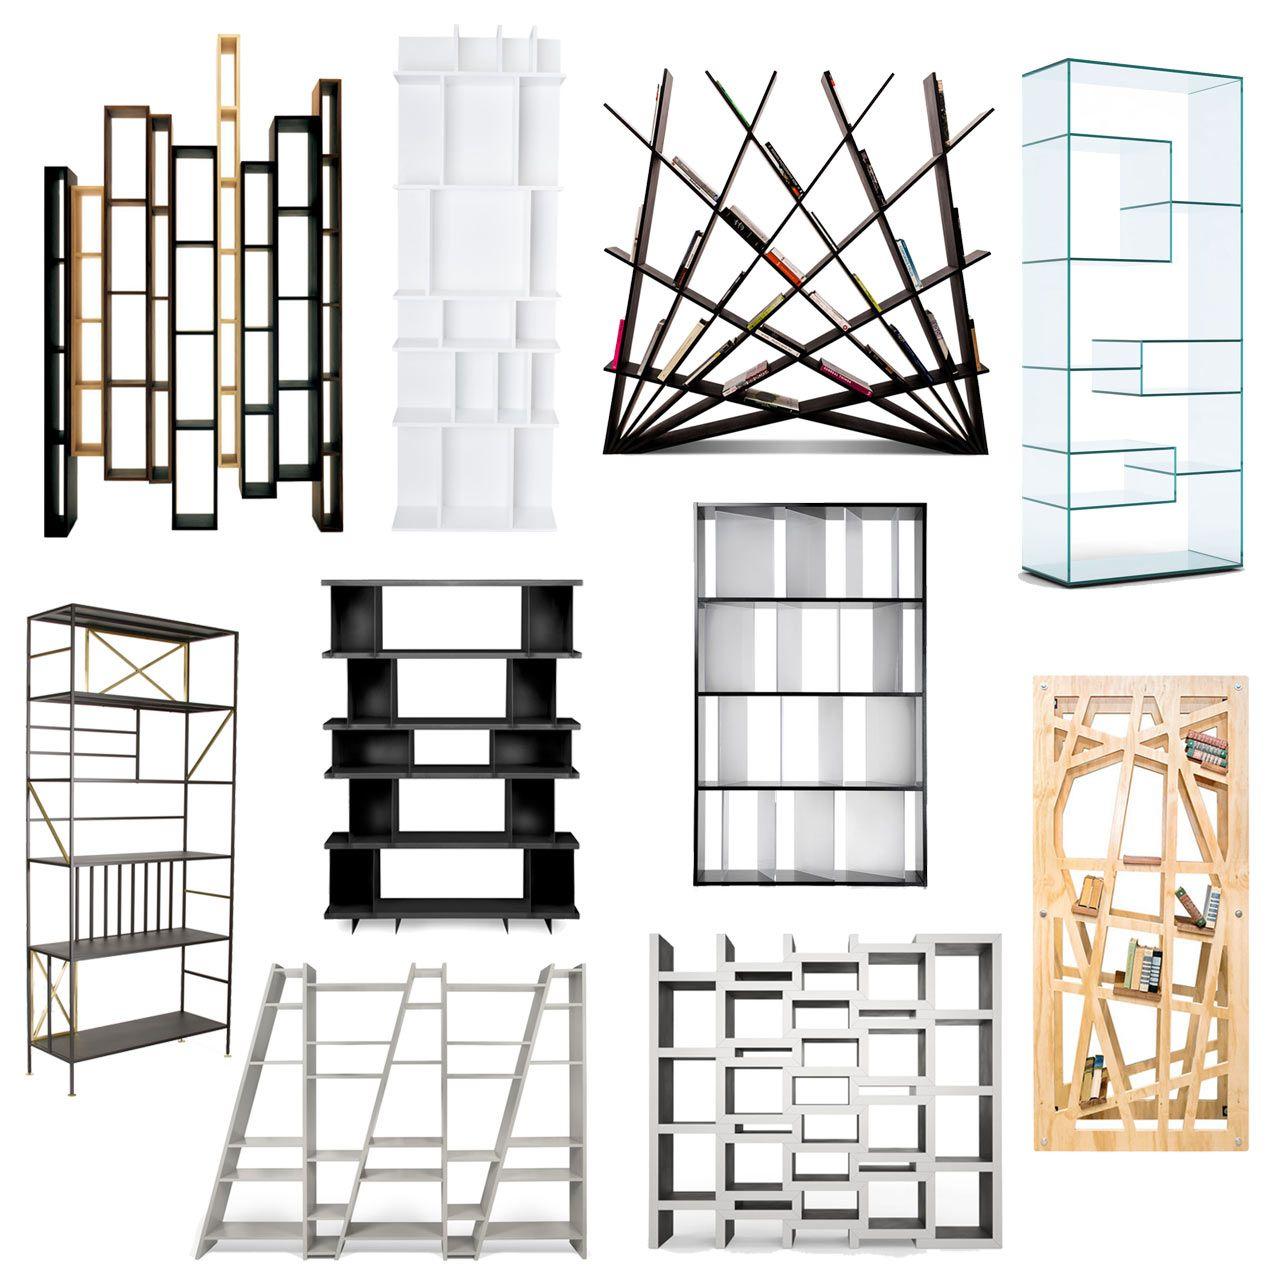 Cool Bookshelves roundup: 10 cool, modern bookshelves | modern bookshelf, modern